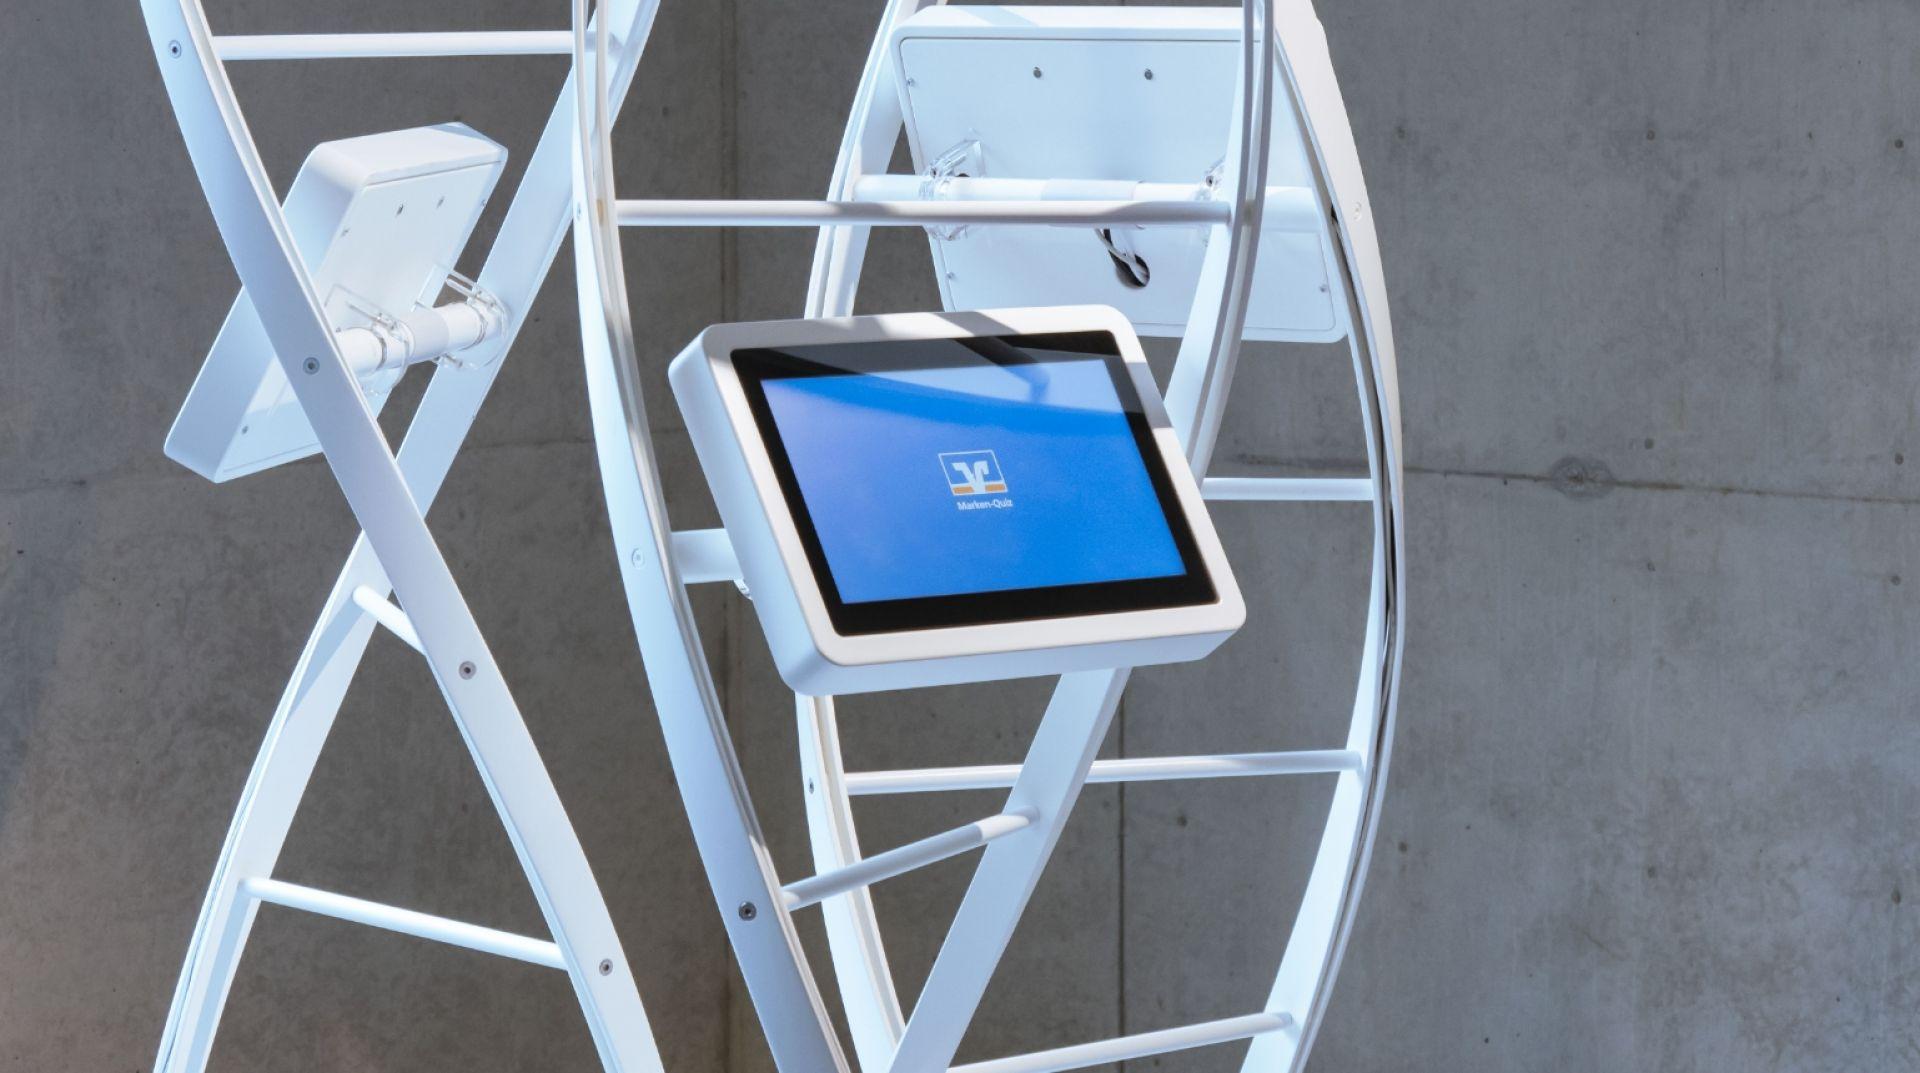 Volksbanken Raiffeisenbanken - Markenturm - Schloß Montabaur - Showroom - Multimedia - Creative Technology - Interactive Experience - Customer Journey - realtime visions